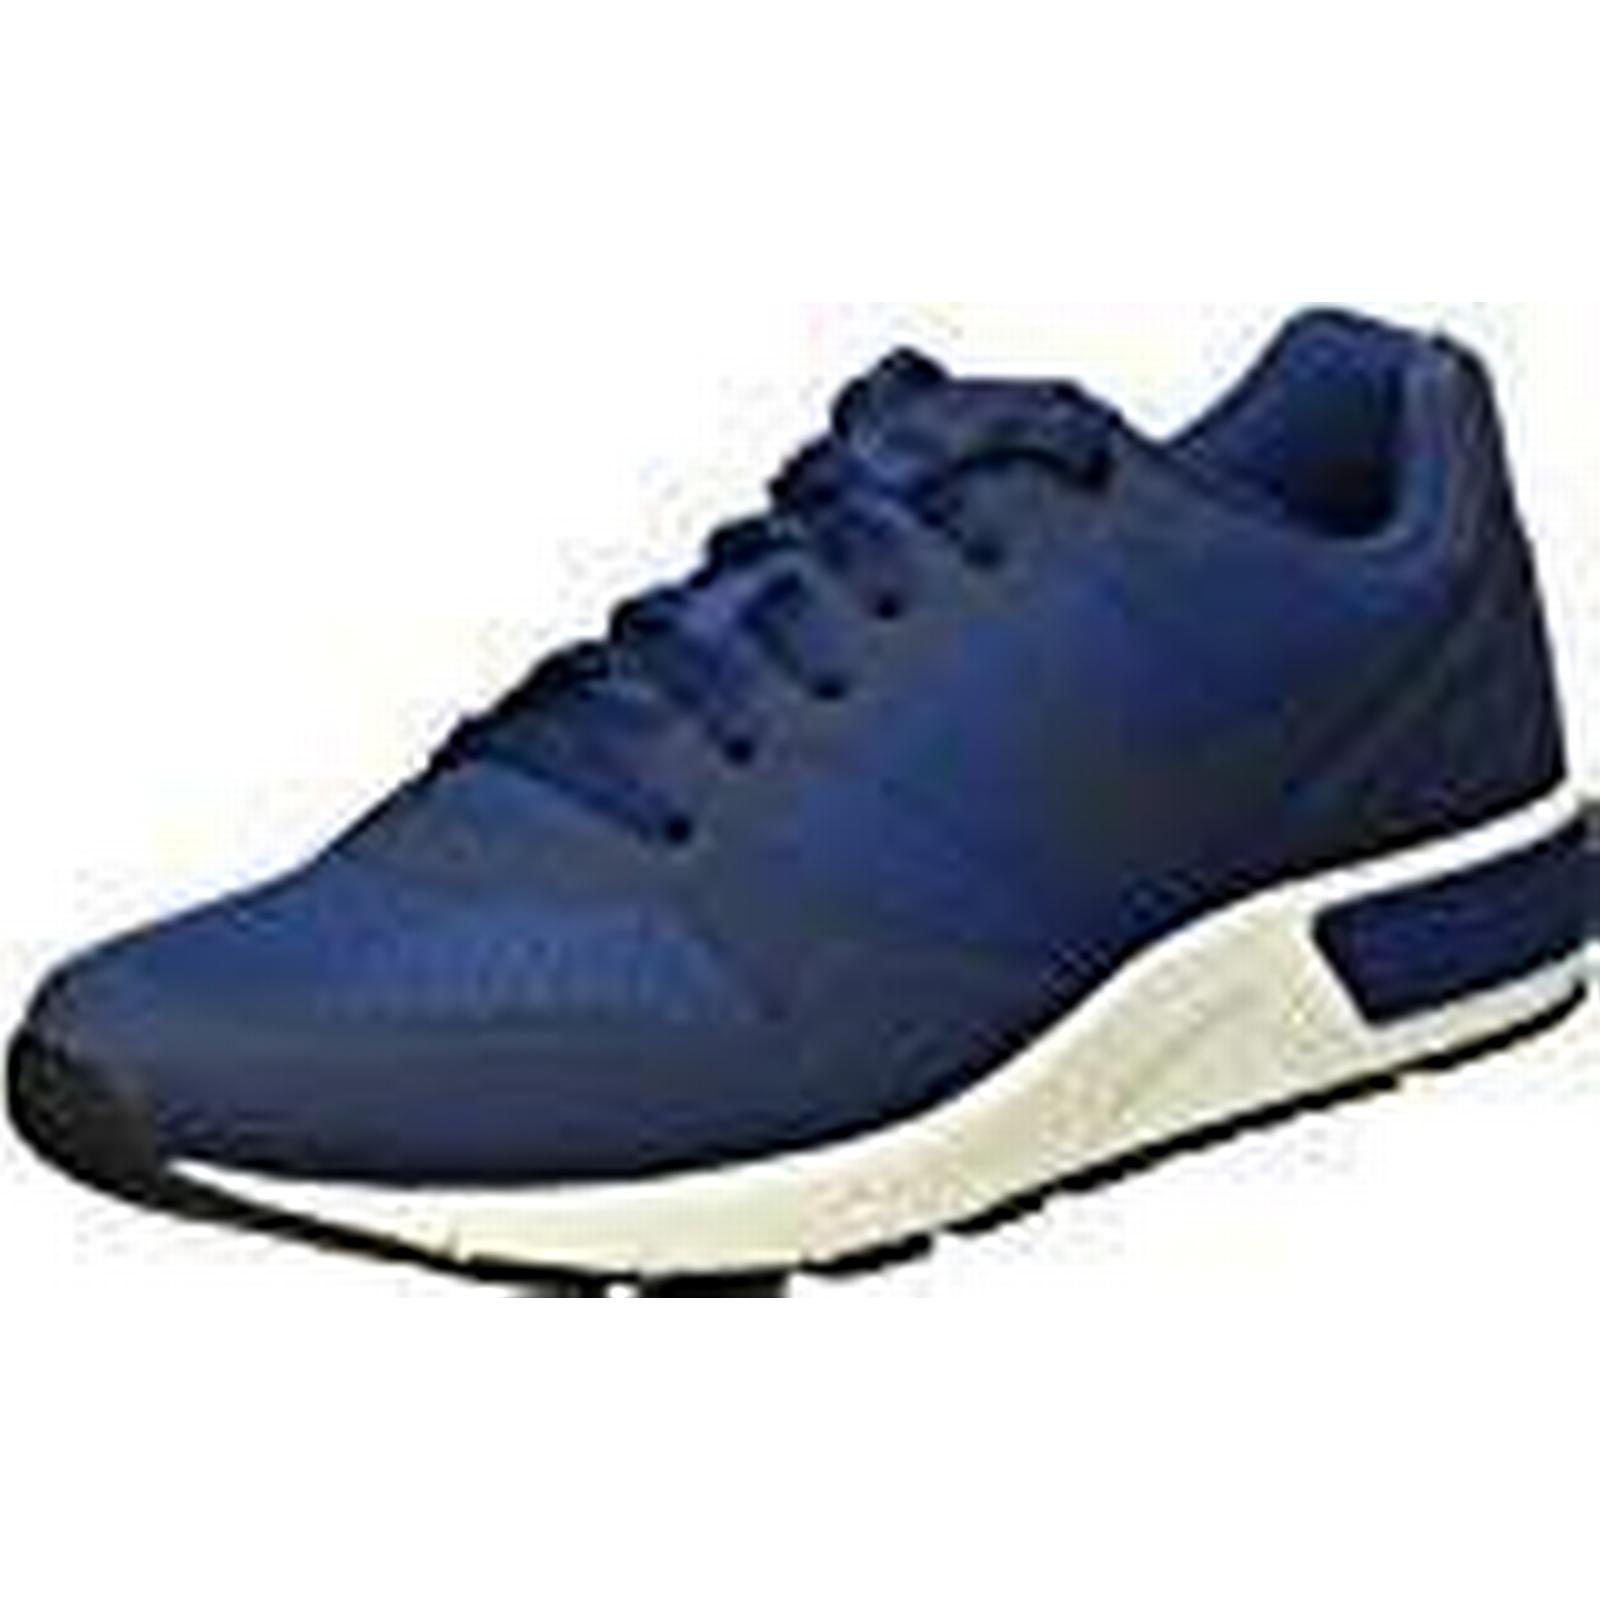 Nike Men's Nightgazer Blue/Midnight Low Trainers, Blue (Coastal Blue/Midnight Nightgazer Navy/Sl), 8.5 UK f56c98